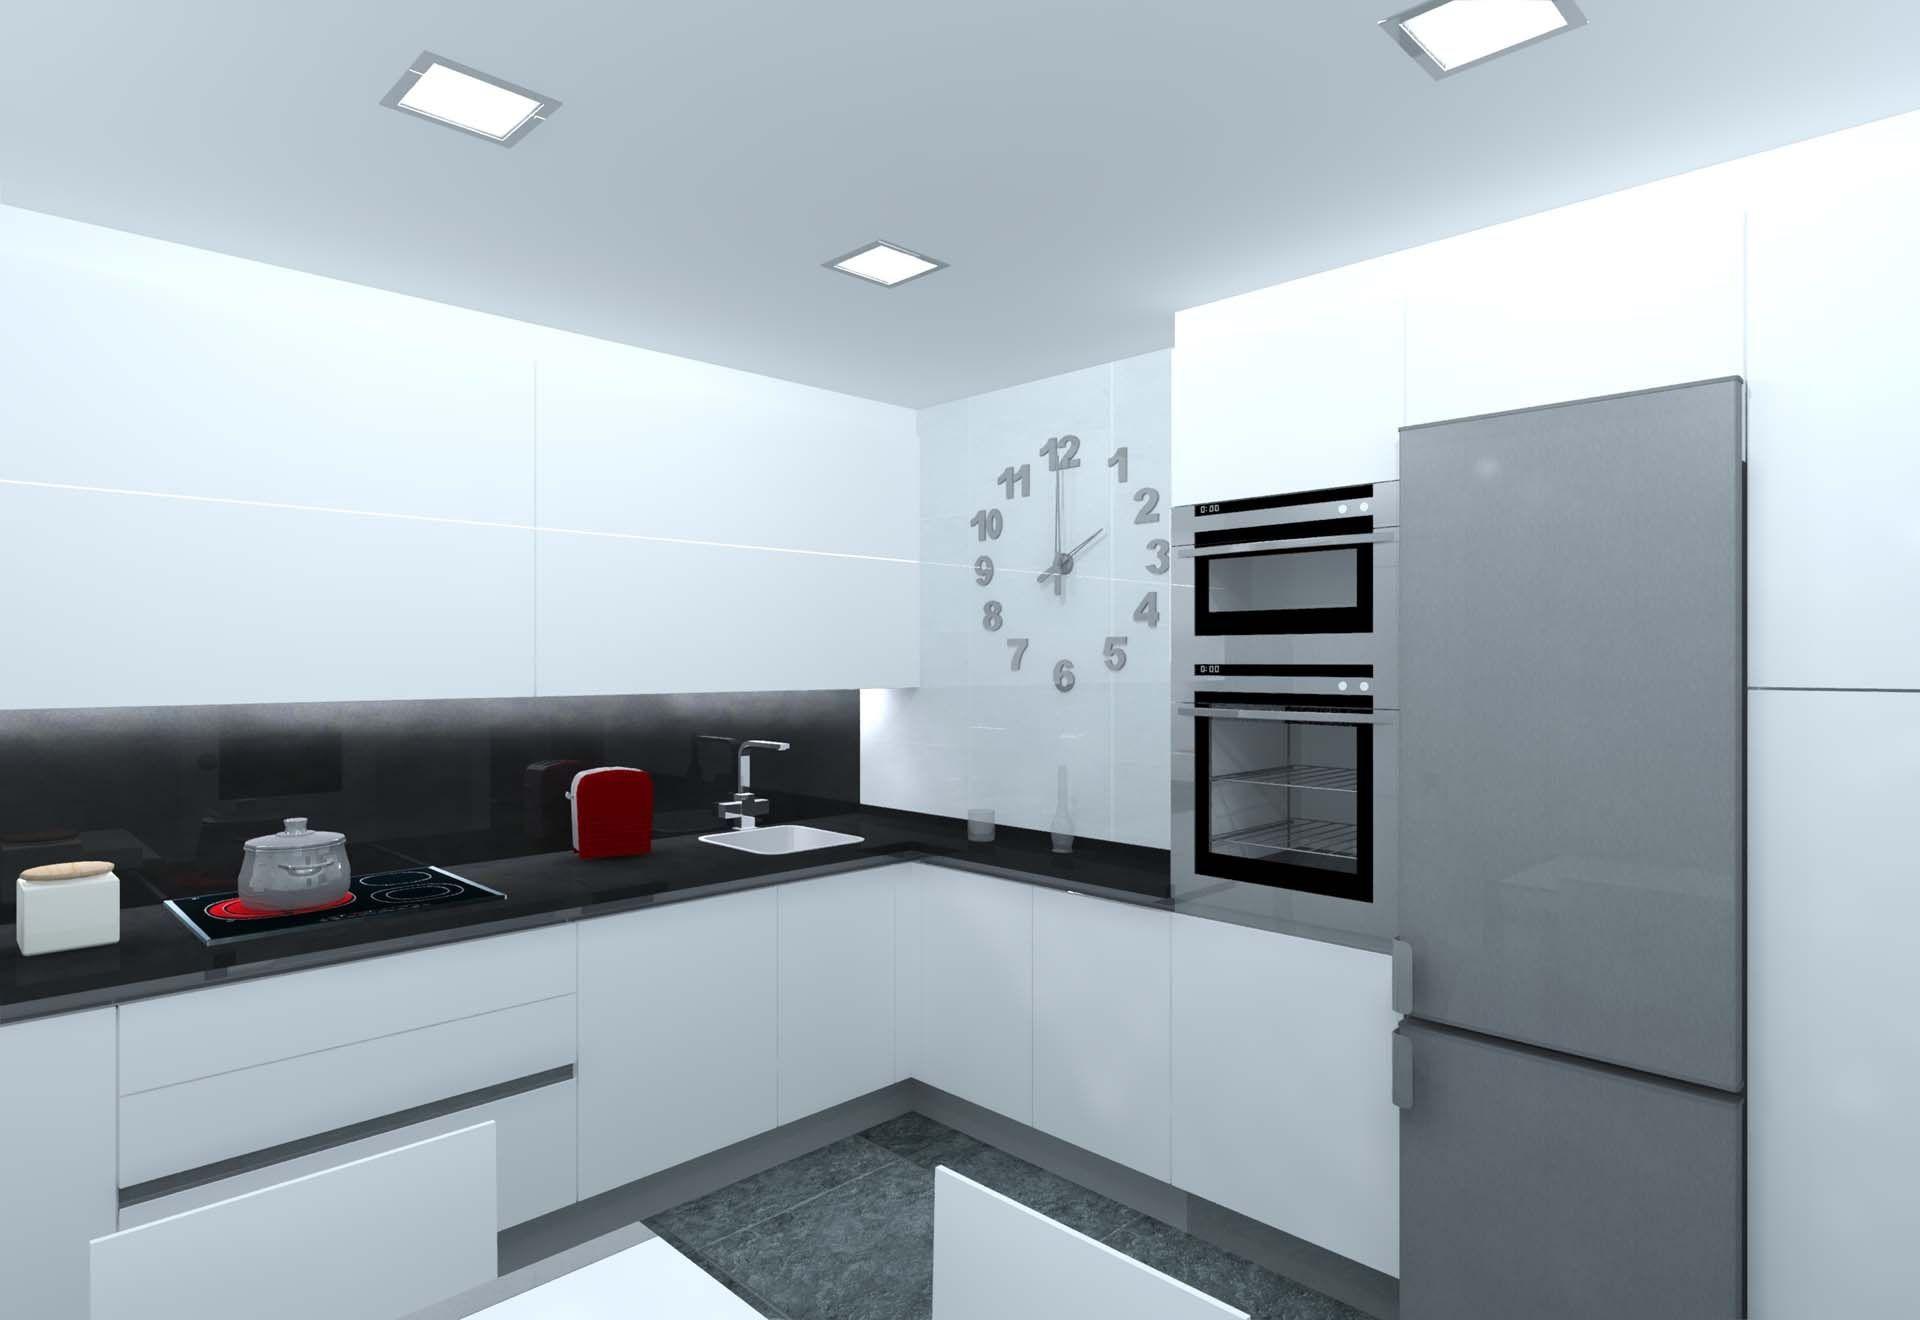 Cocina Blanco Mate Con Gola De Aluminio El Diseno De Esta Cocina